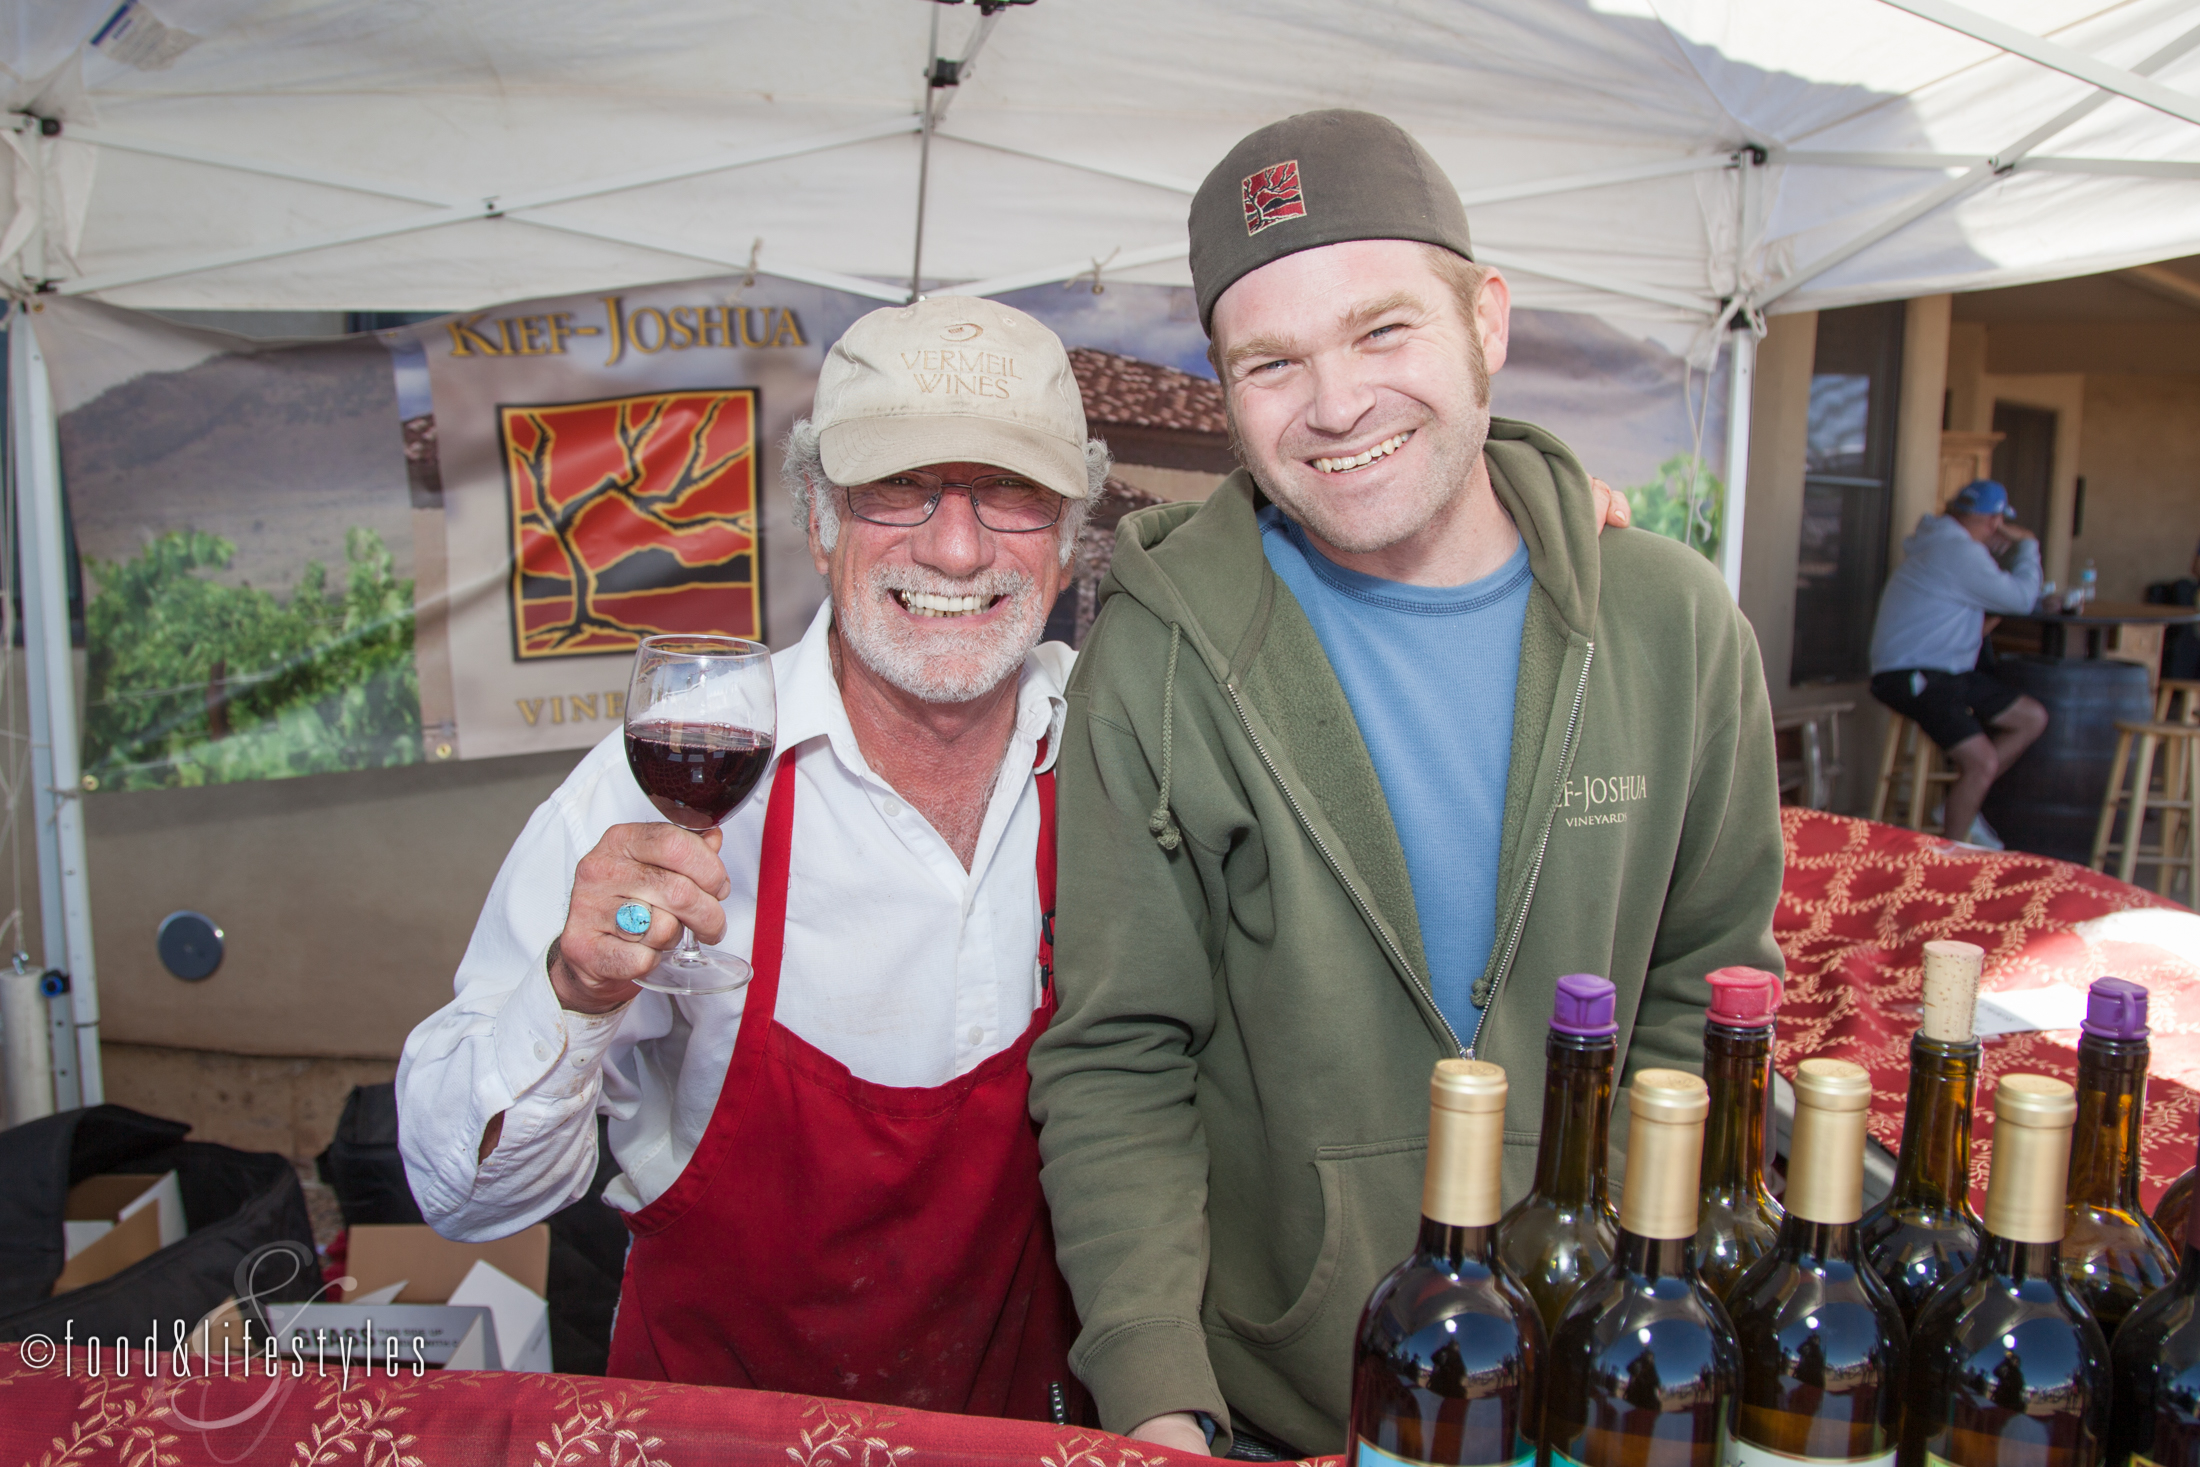 Winemaker Kief Joshua Manning.